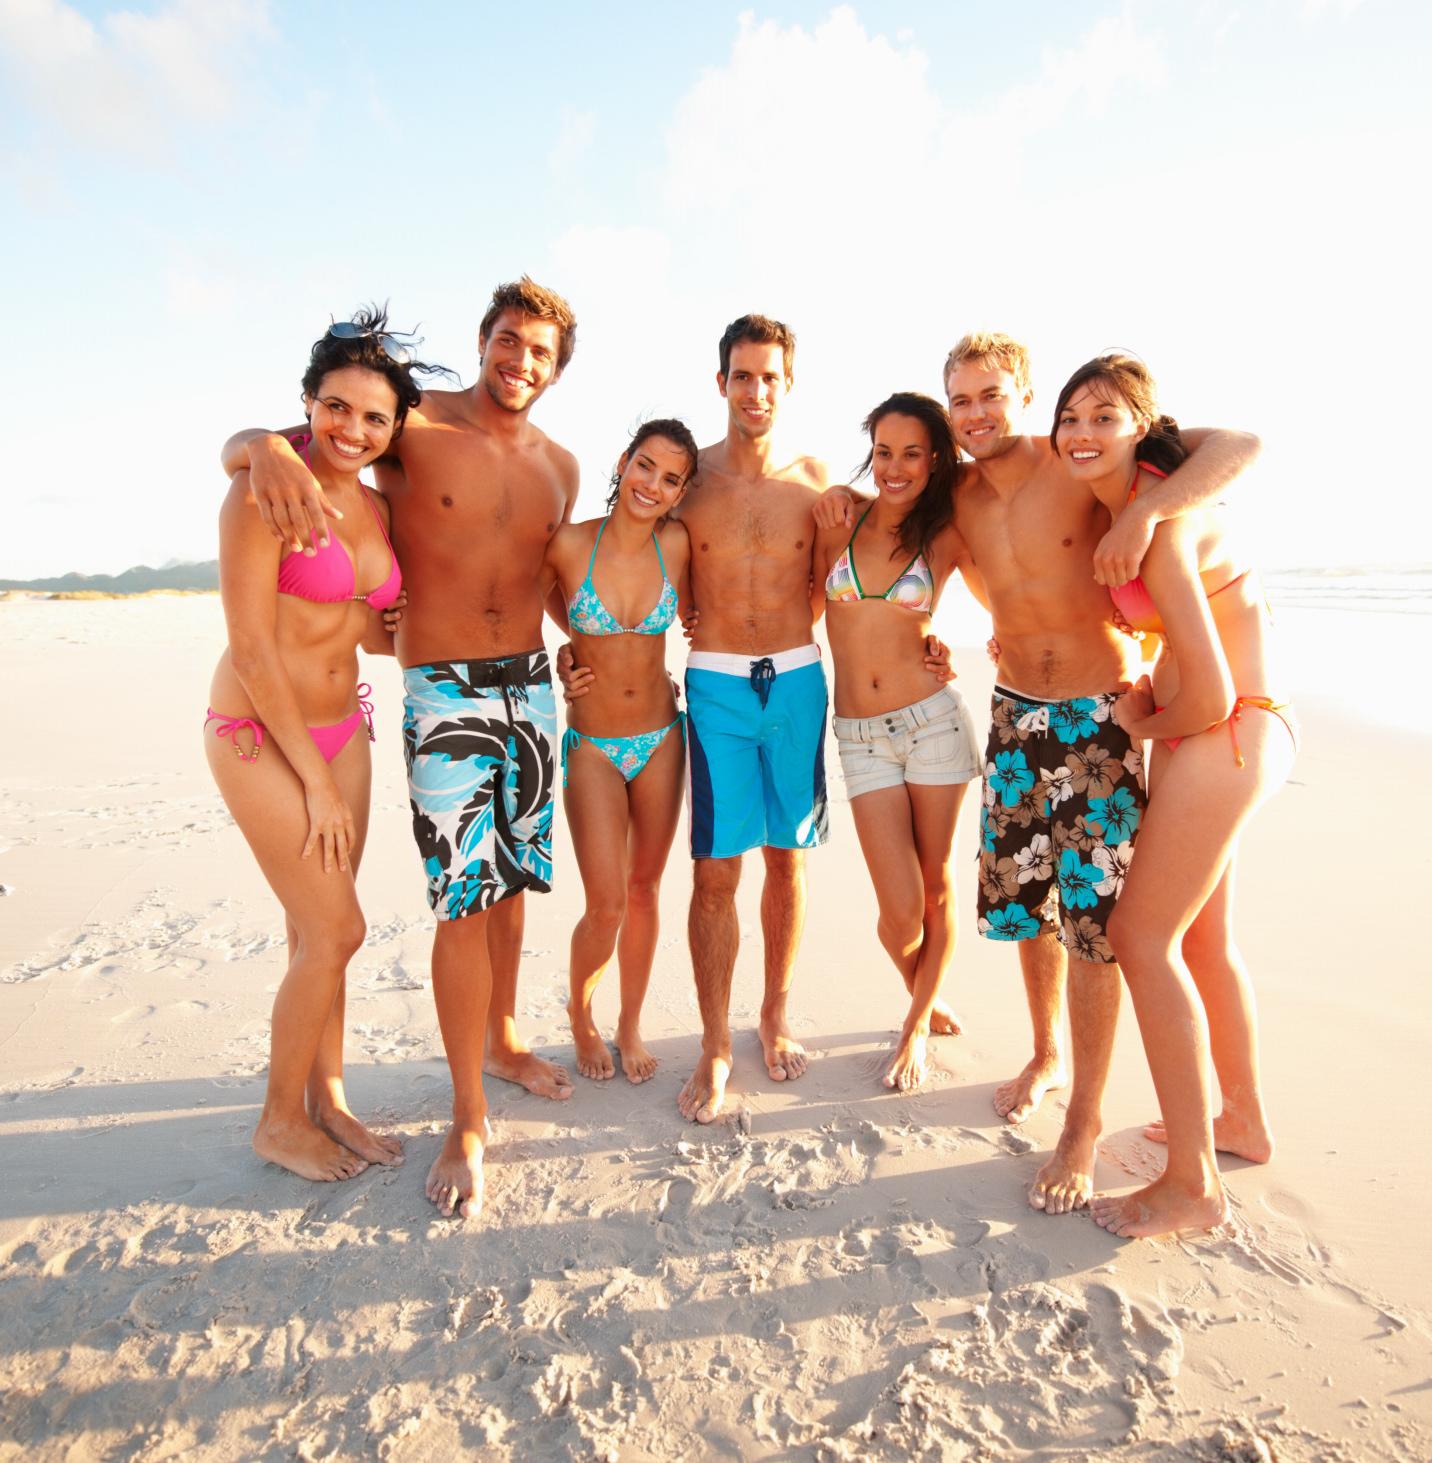 Venner på stranden - Tyrkiet